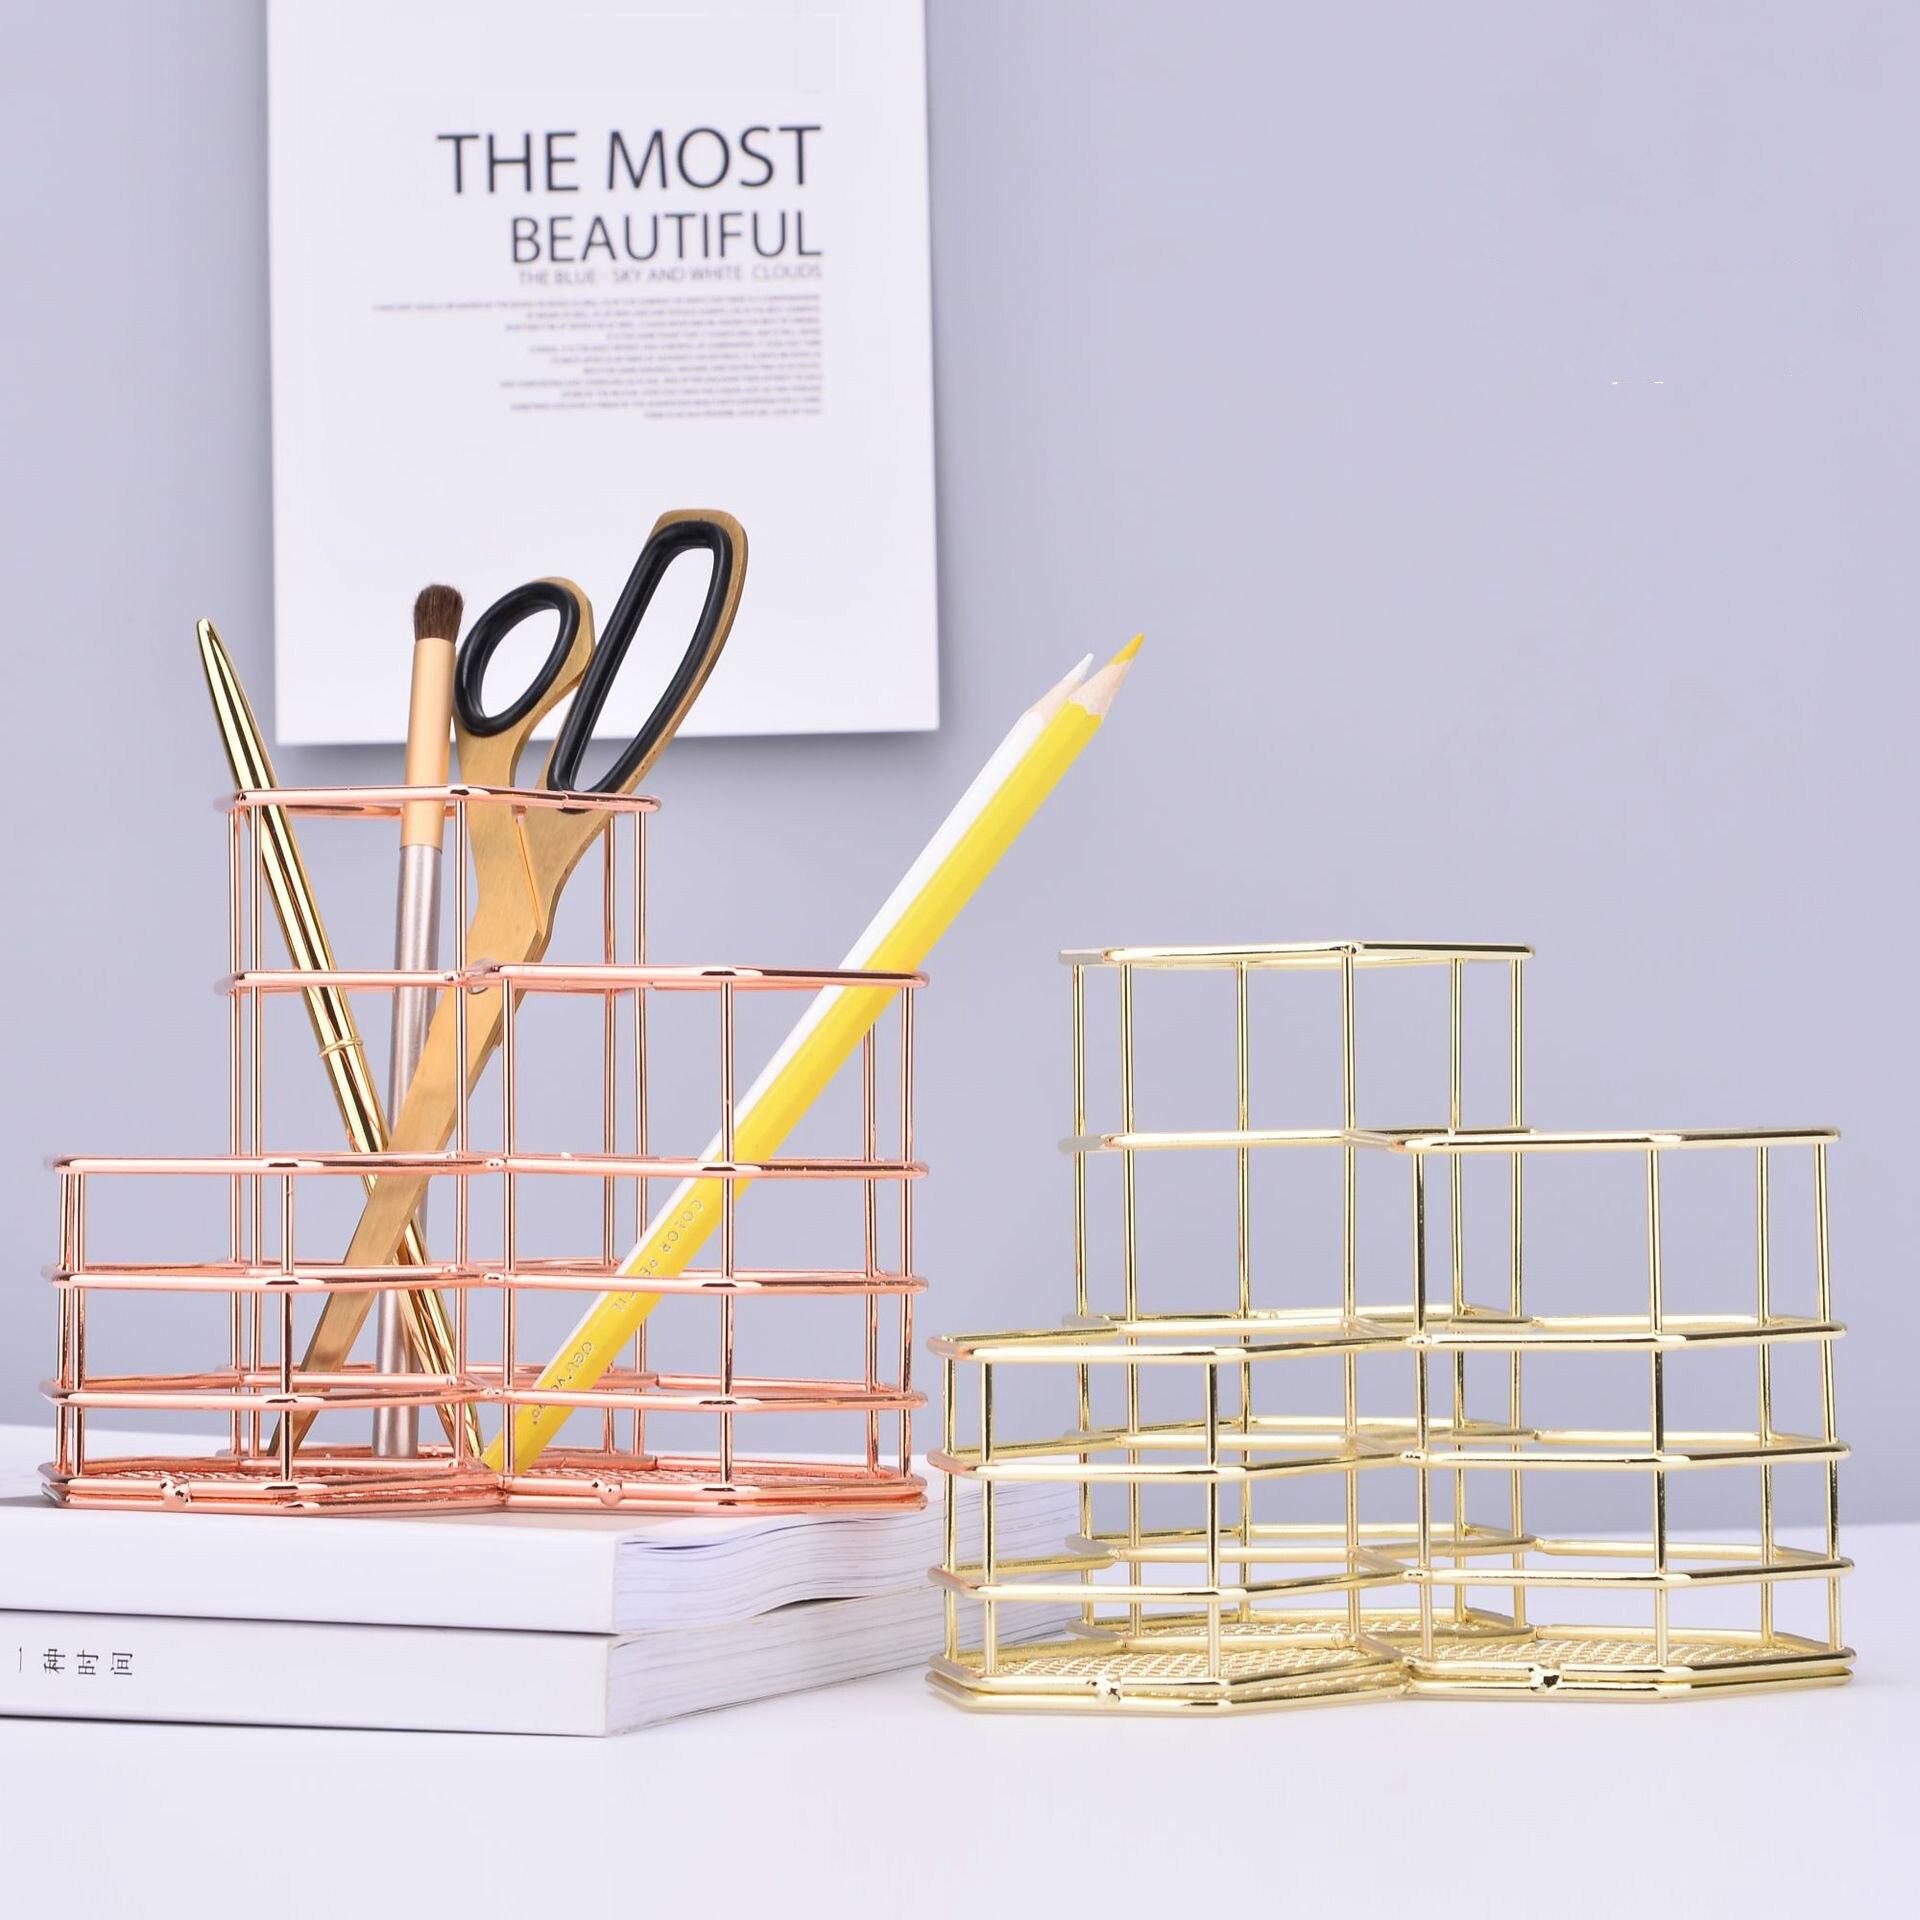 Rose Gold Hollow Pen Holder Pencil Pot Box Case Makeup Brushes Storage Desk  Organiser Container Stationery Decor Storage Gift